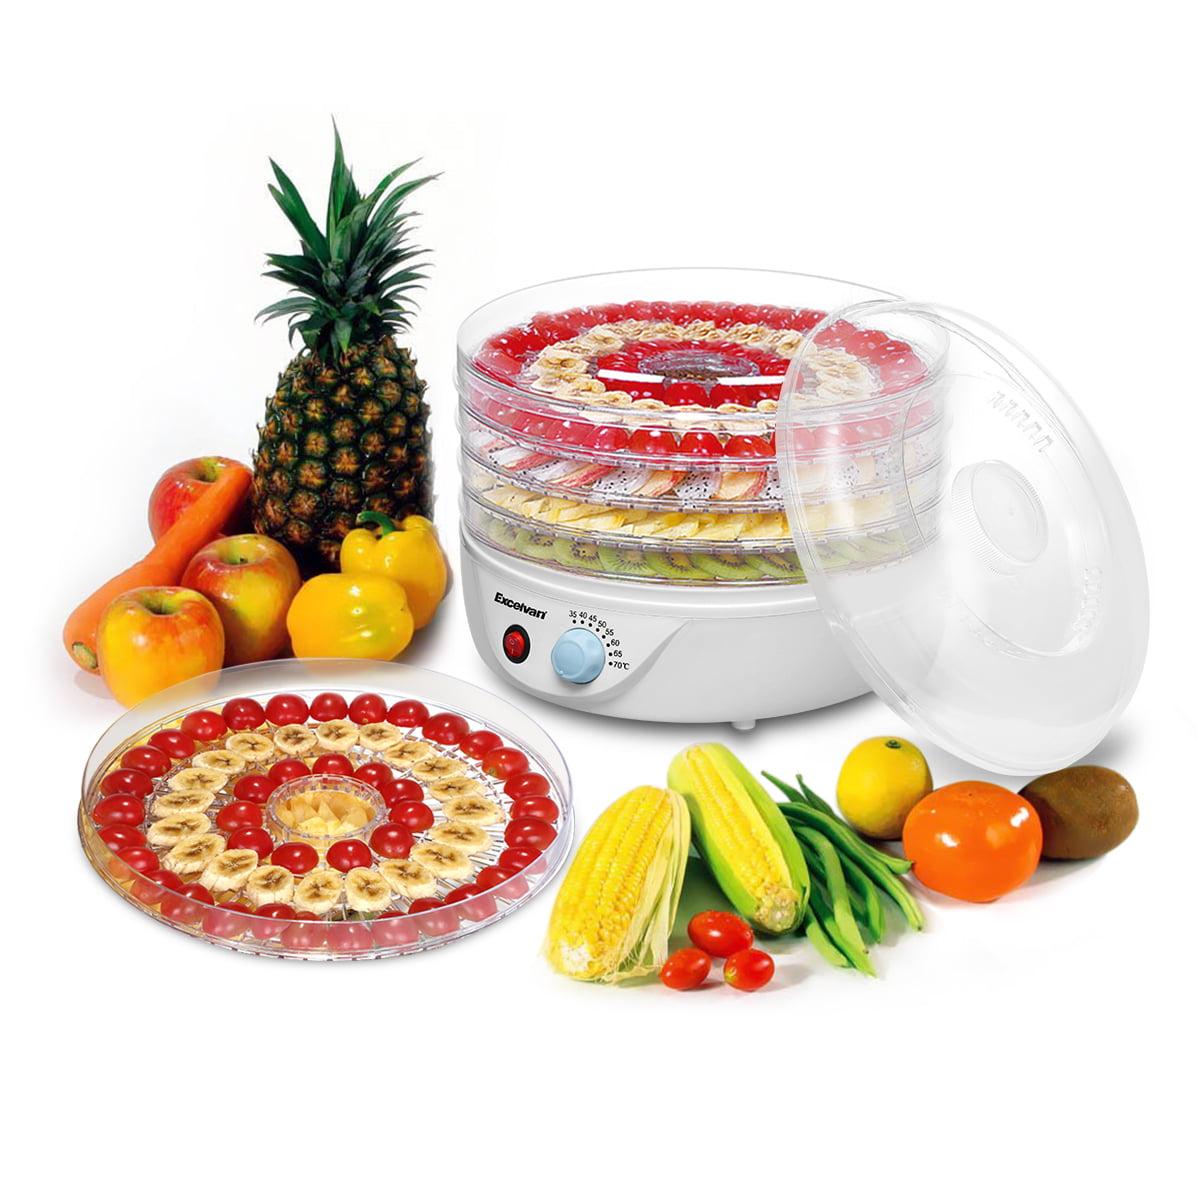 Sancusto 5 Tier 240W Airflow Circulation c Food Fruit Dehydrator Dryer for Meat Fruit Food Jerky Maker